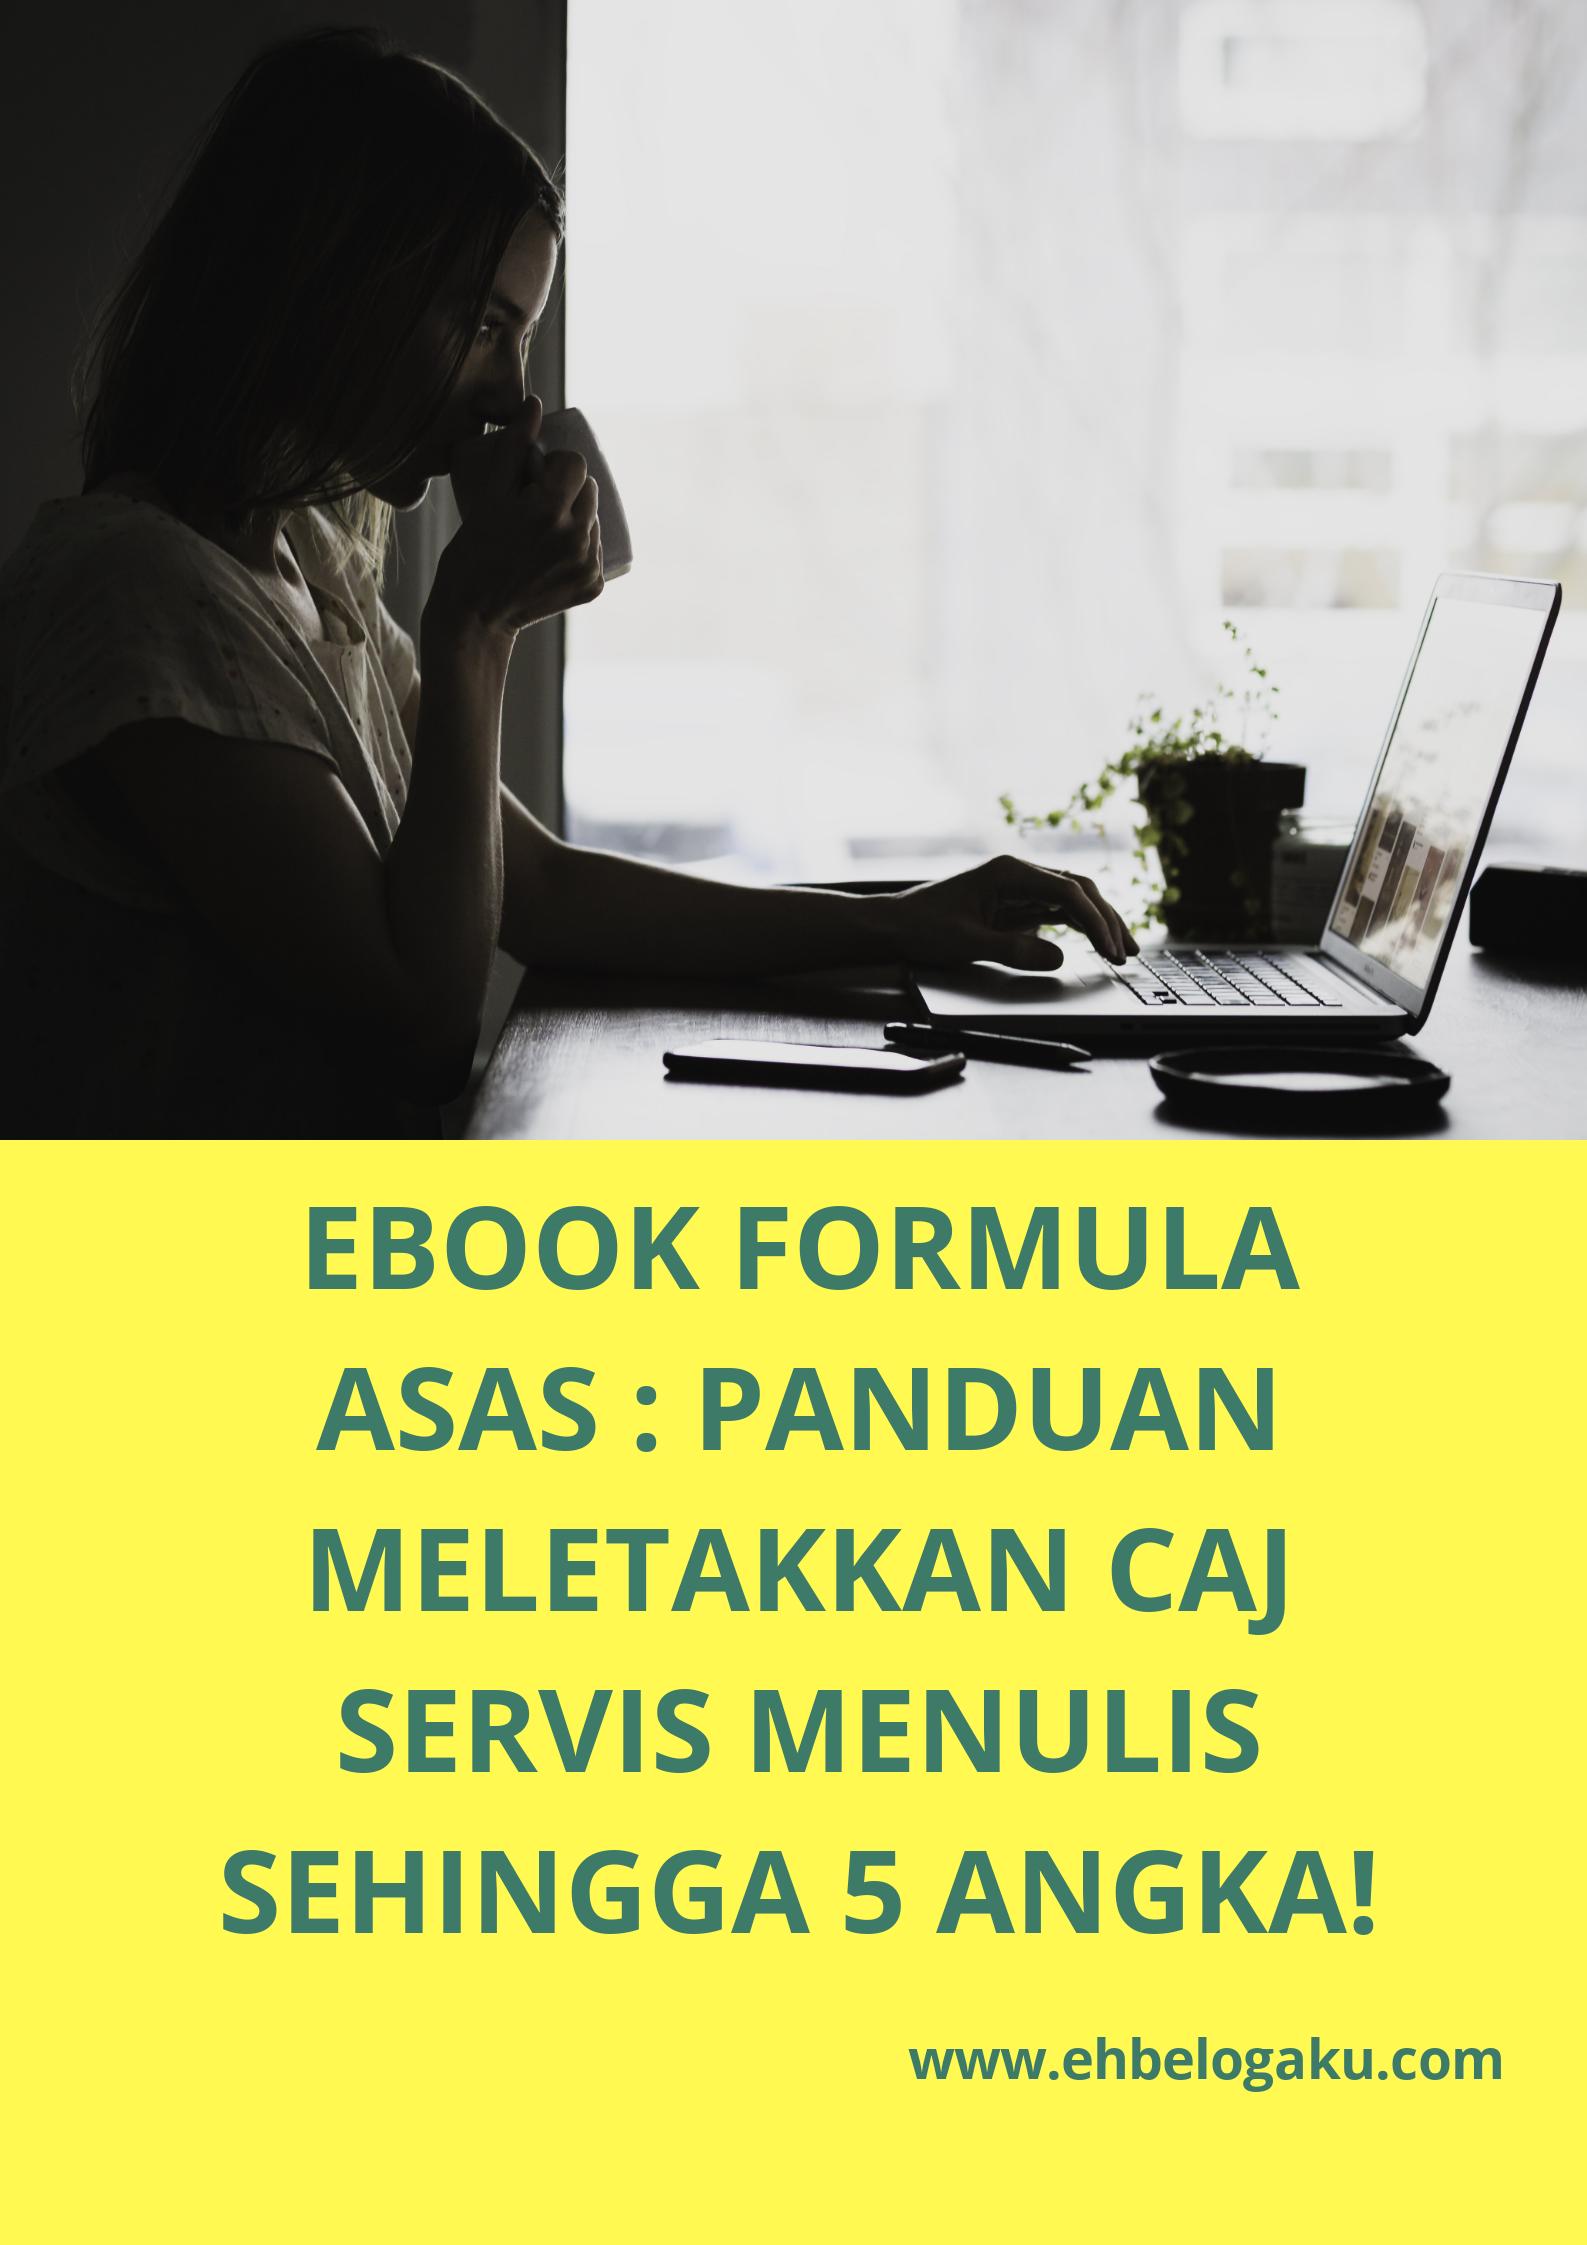 Ebook panduan meletakkan caj servis menulis